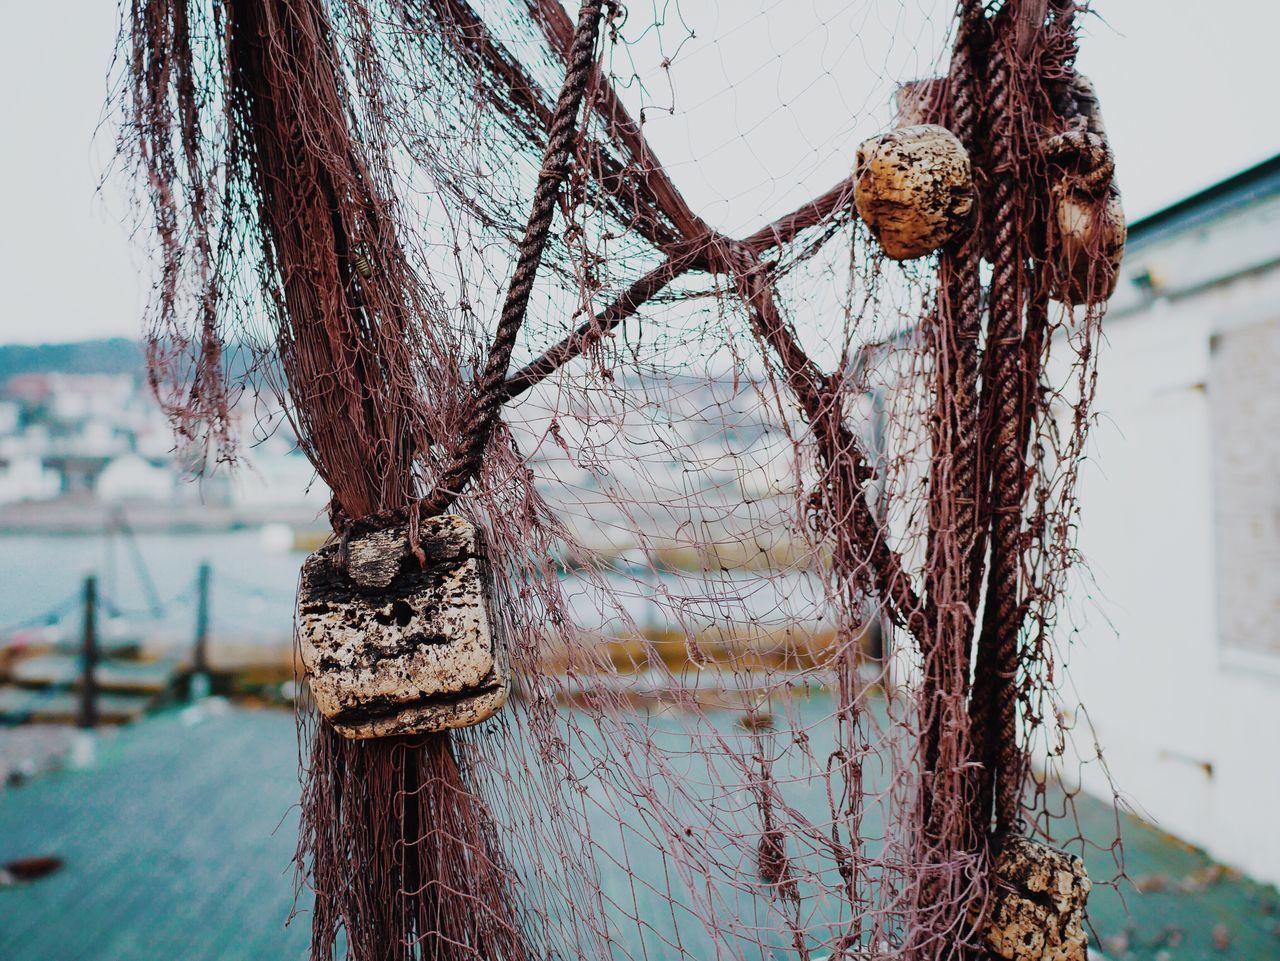 Close-Up Of Abandoned Fishing Net